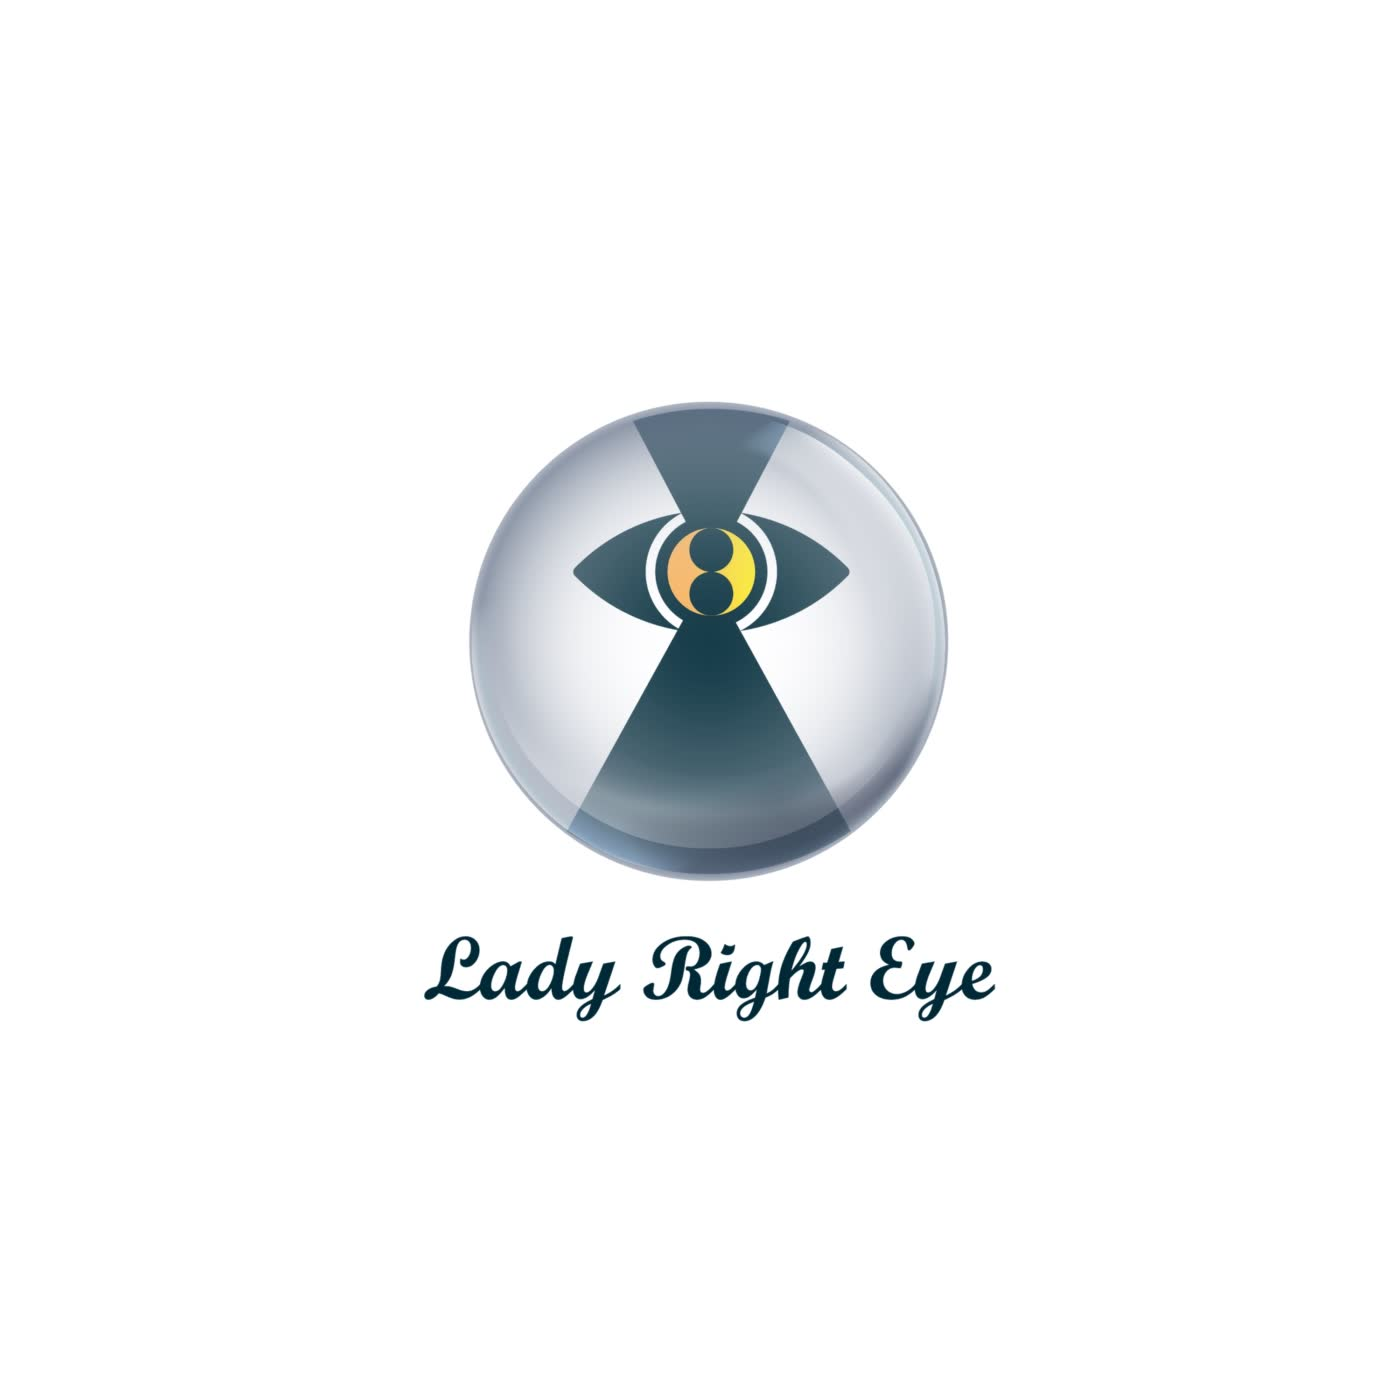 Lady Right Eye News Eye右眼夫人新聞眼